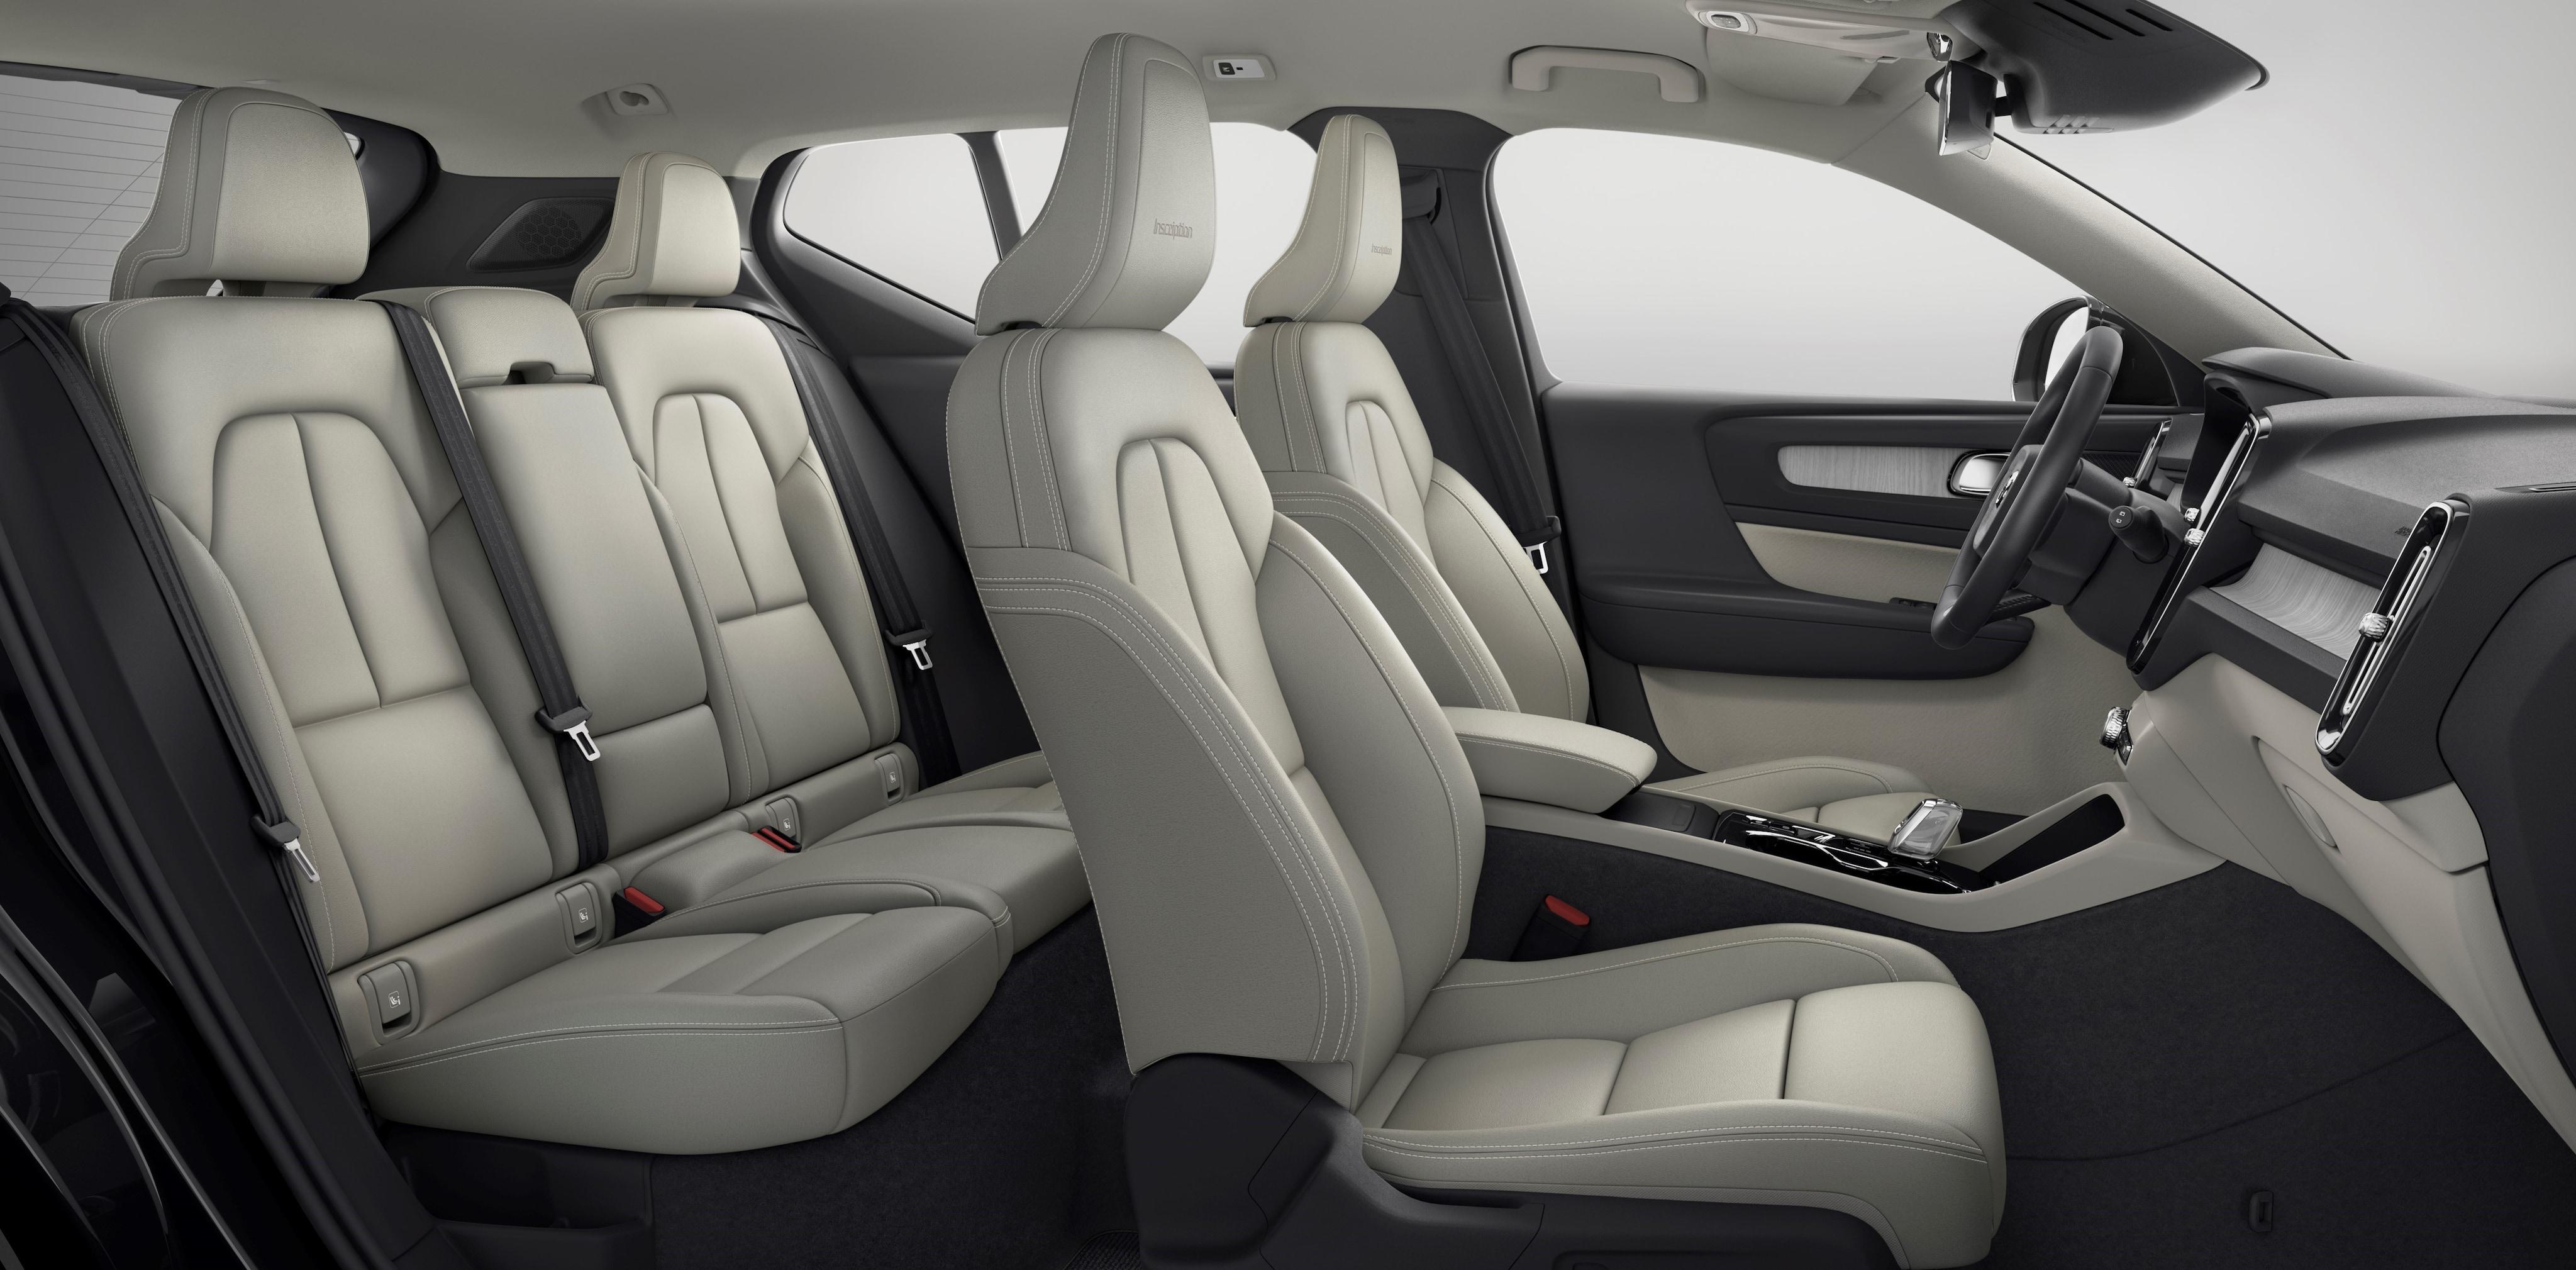 volvo deals nj dealership htm summit cars smythe new polestar if lease in